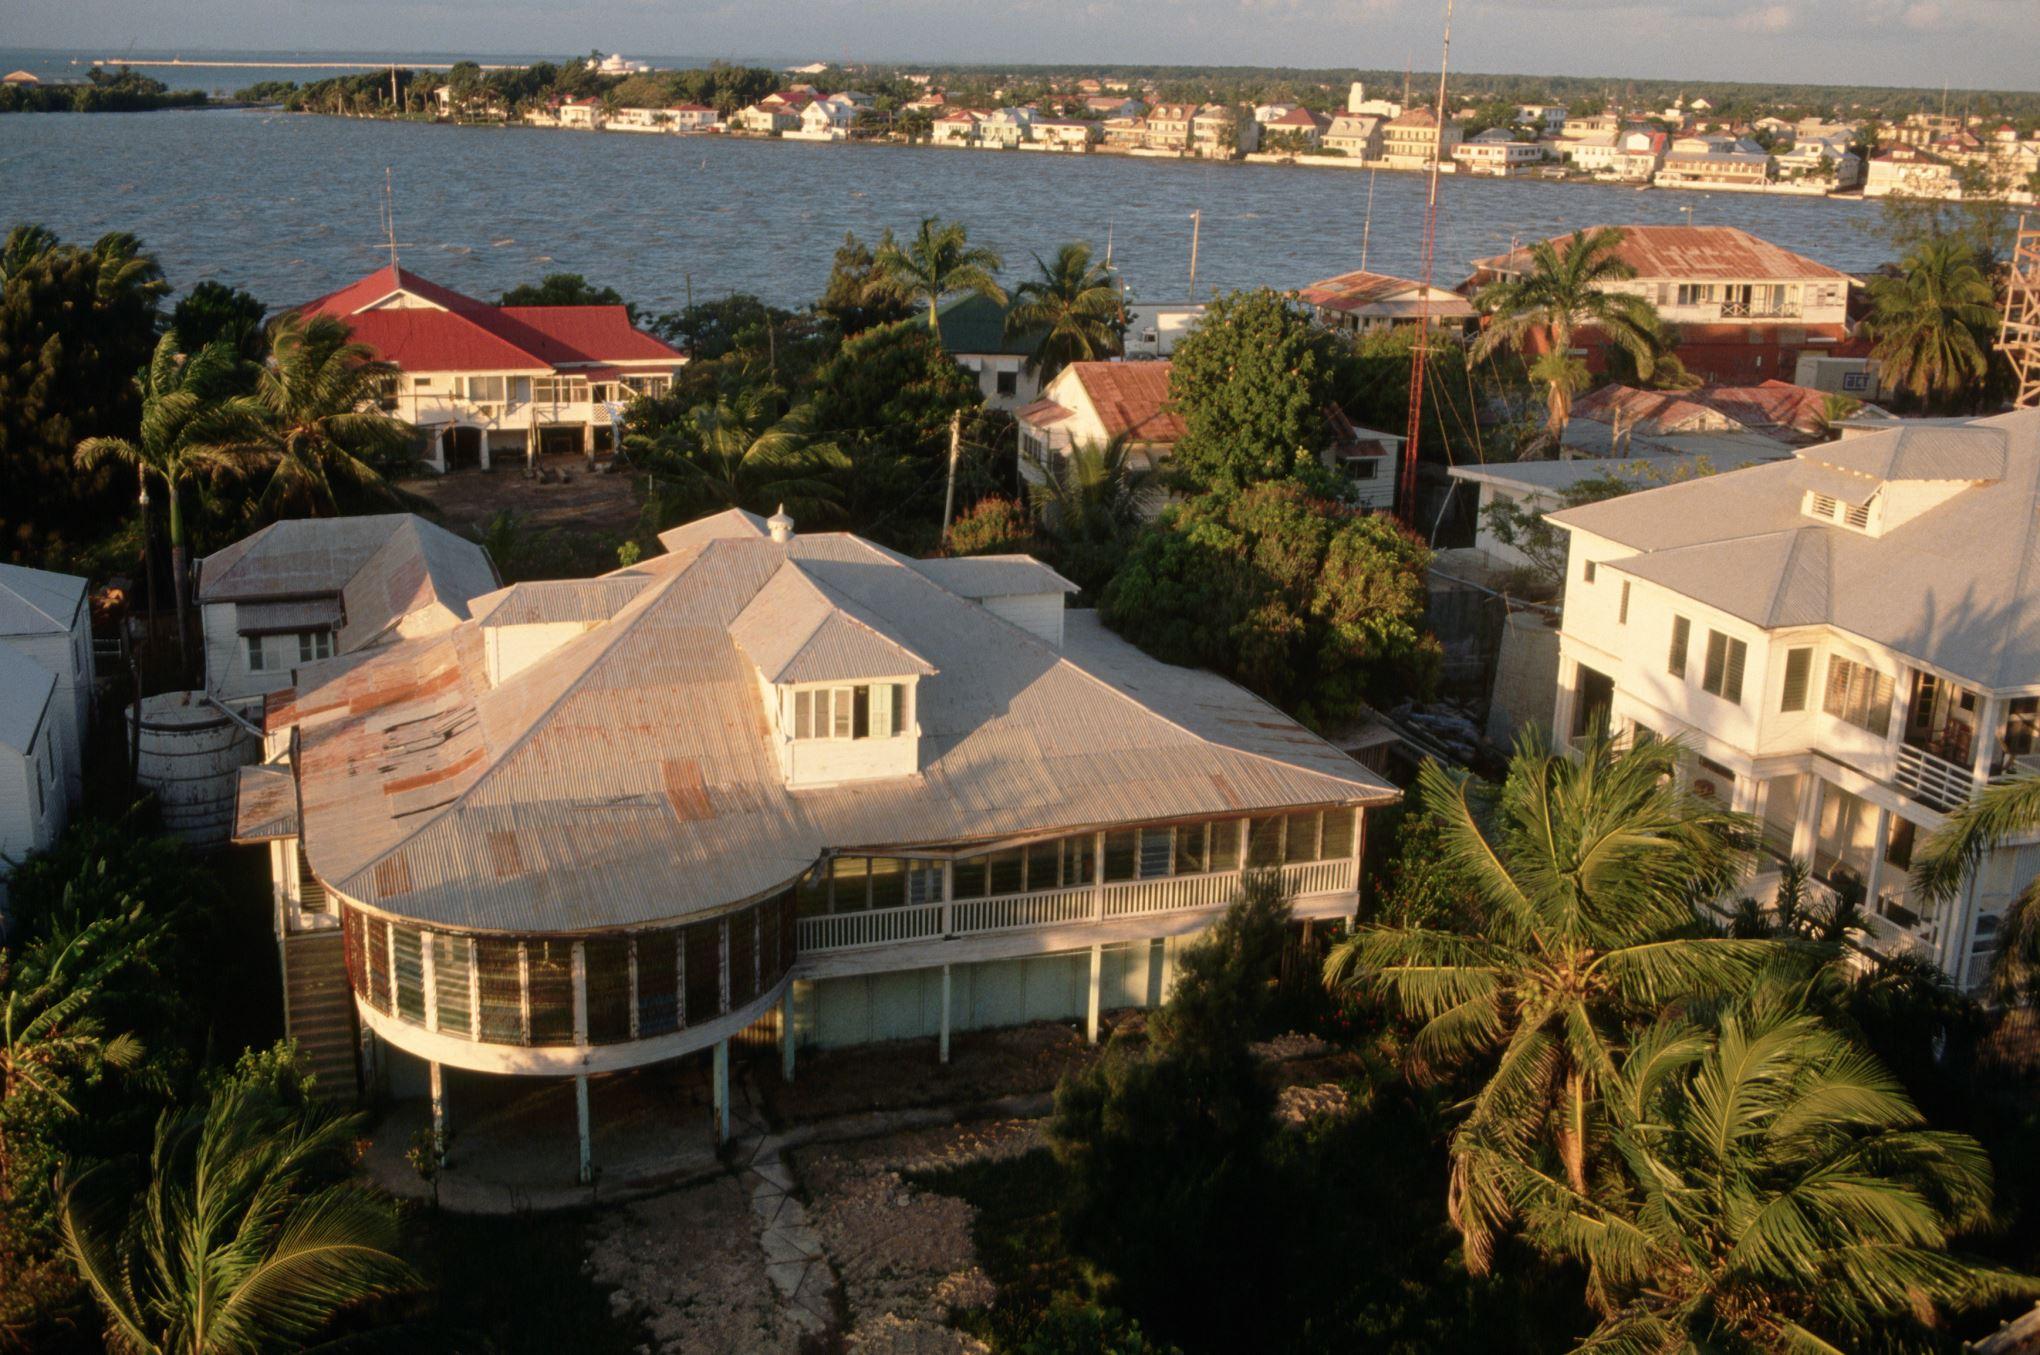 Belize City, Belize: